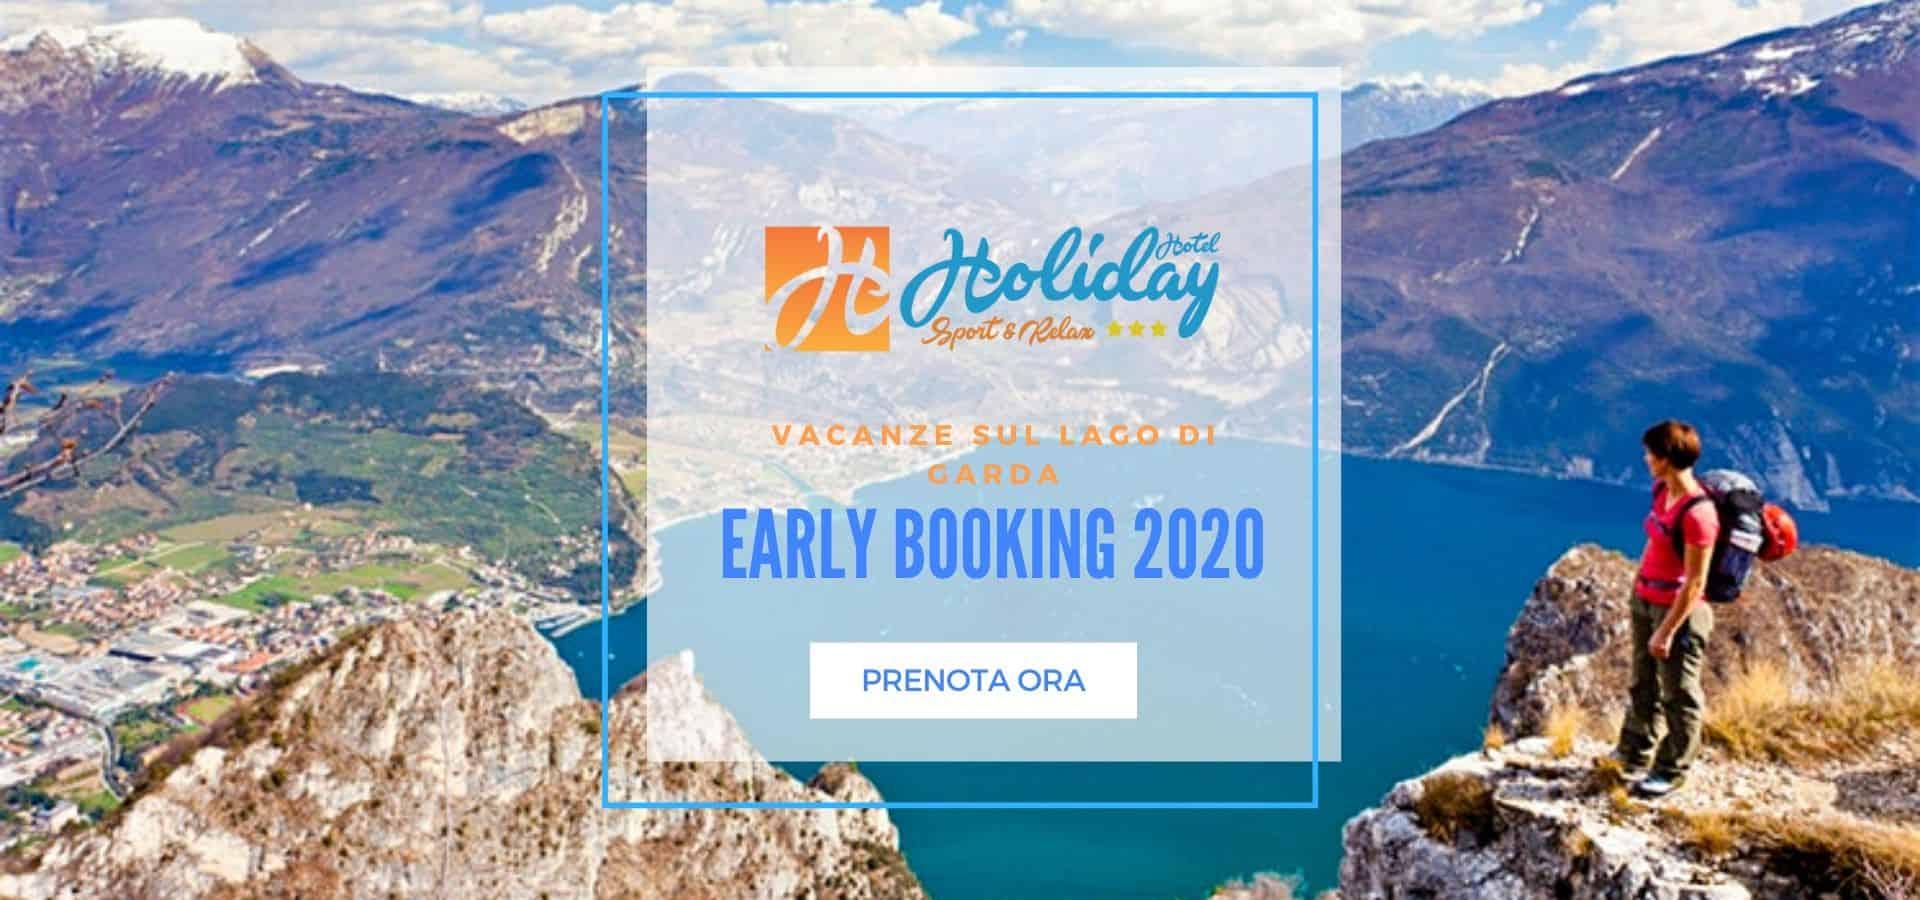 hOTEL LAGO DI GARDA - OFFERTE 2020